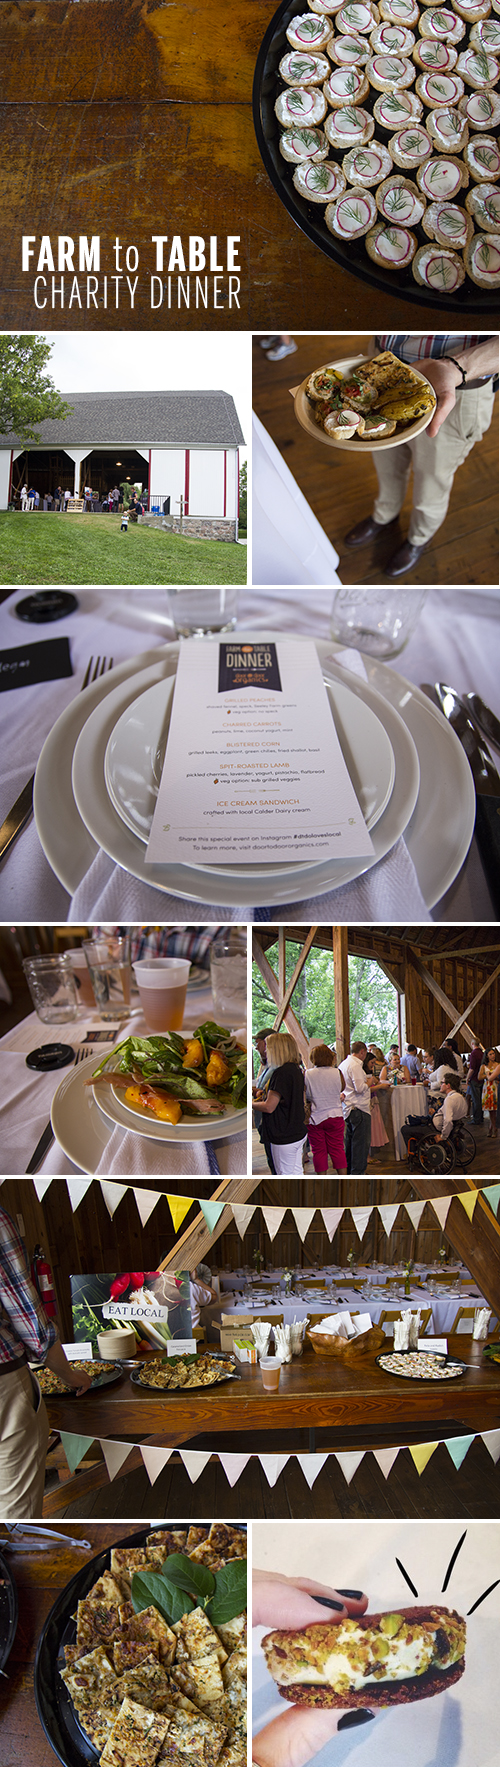 Farm to Table Charity Dinner // take a megabite